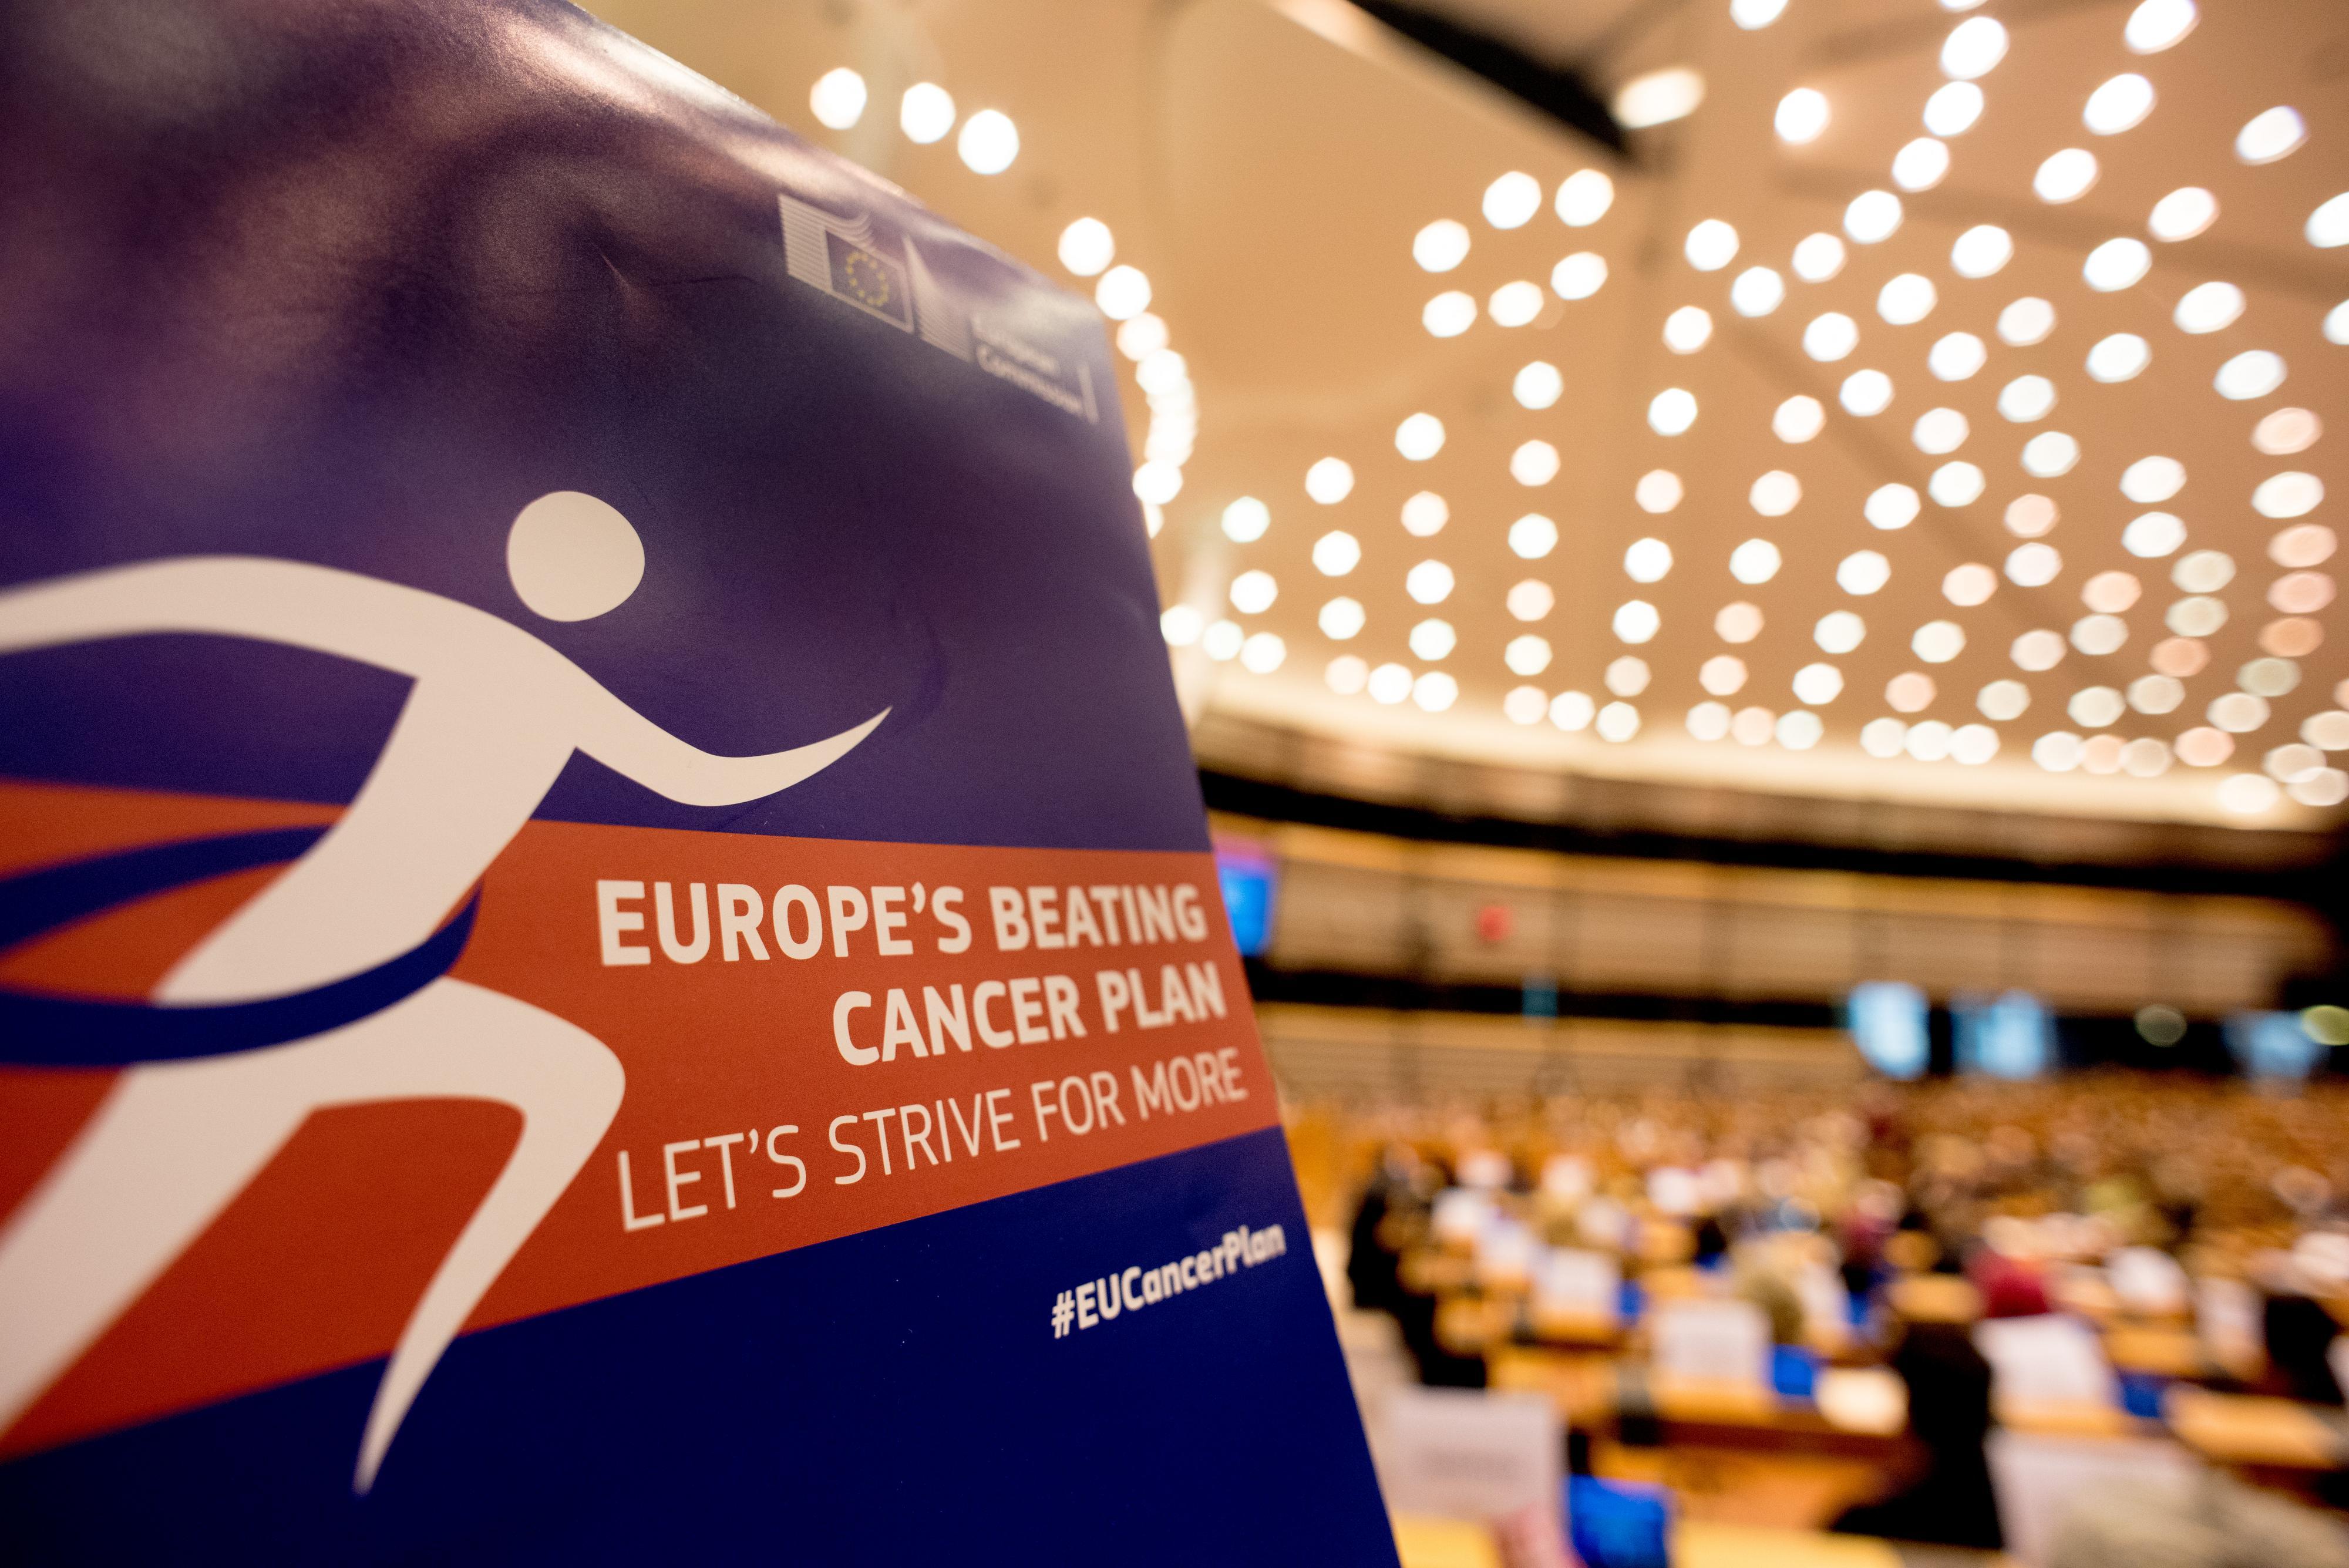 Poster: Europe's Beating Cancer Plan. Photo: European Union 2020